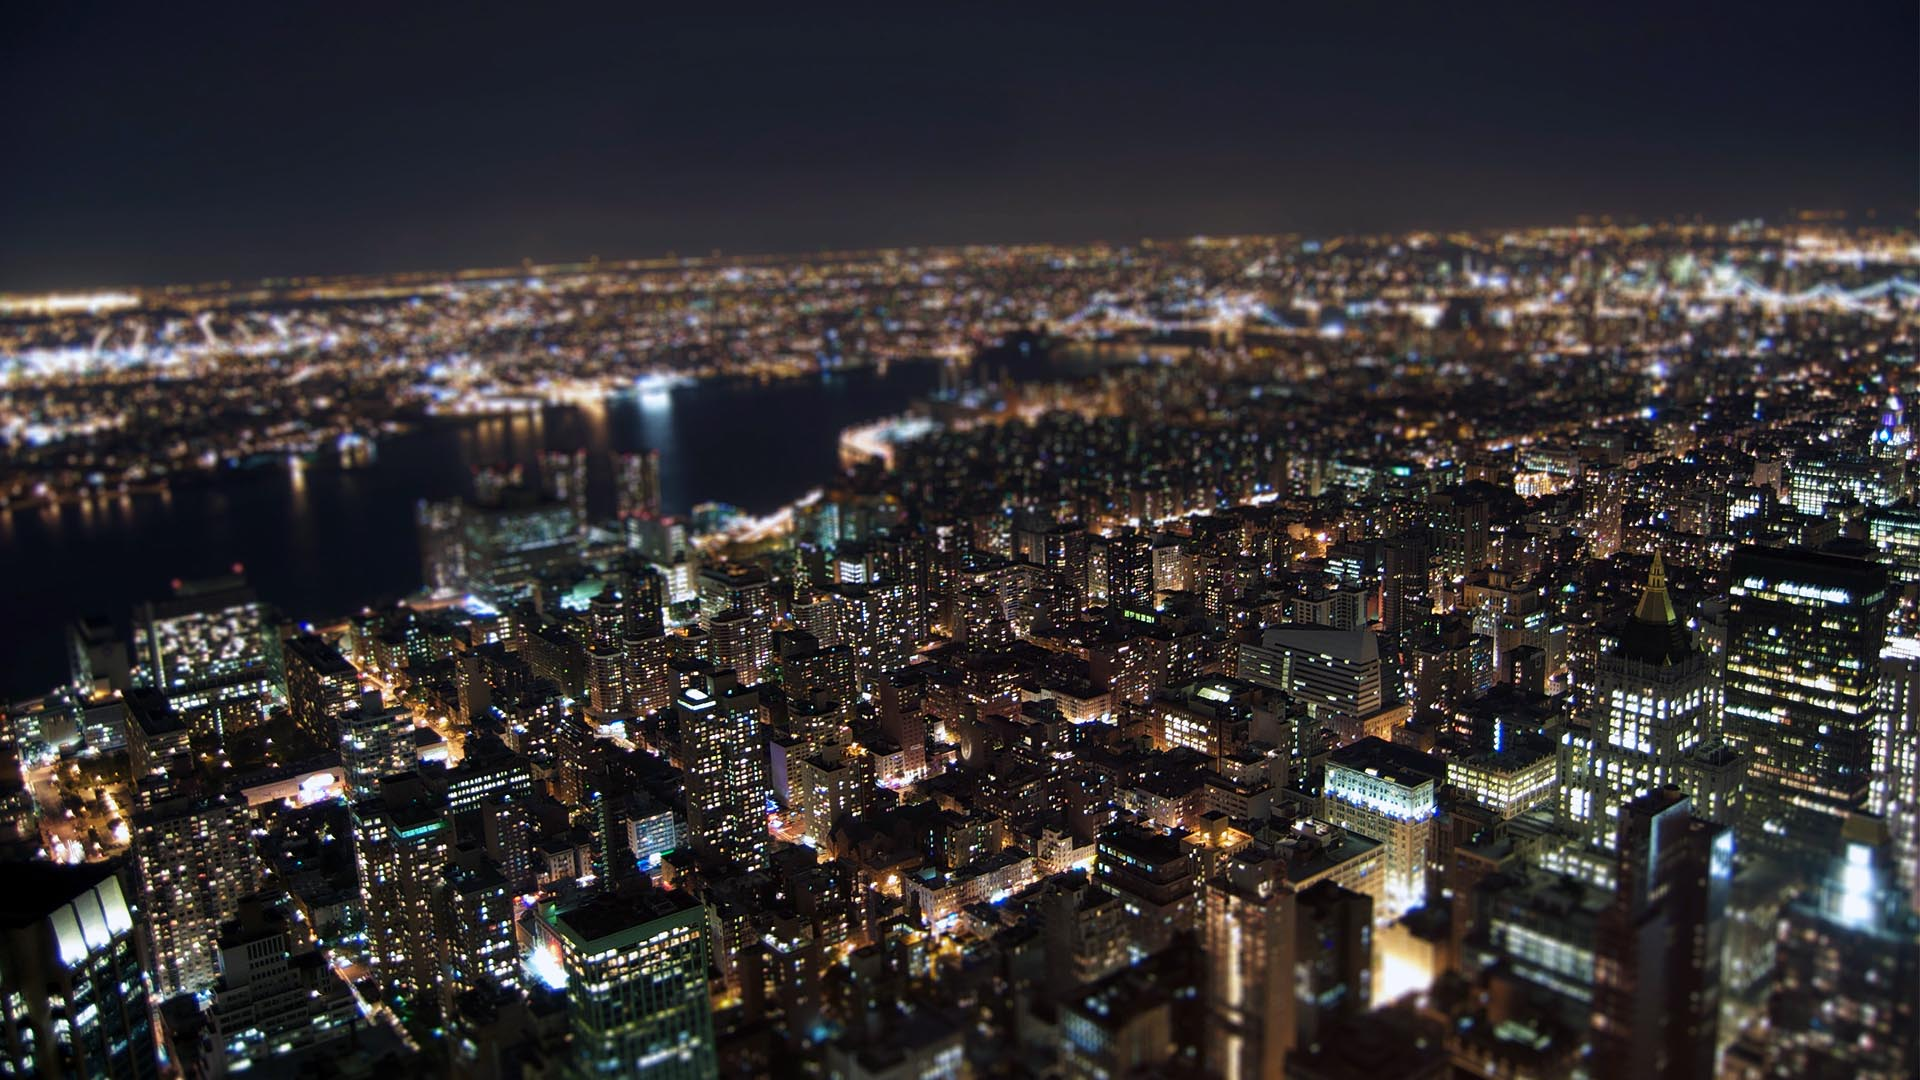 New York Night HD Wallpaper FullHDWpp   Full HD Wallpapers 1920x1080